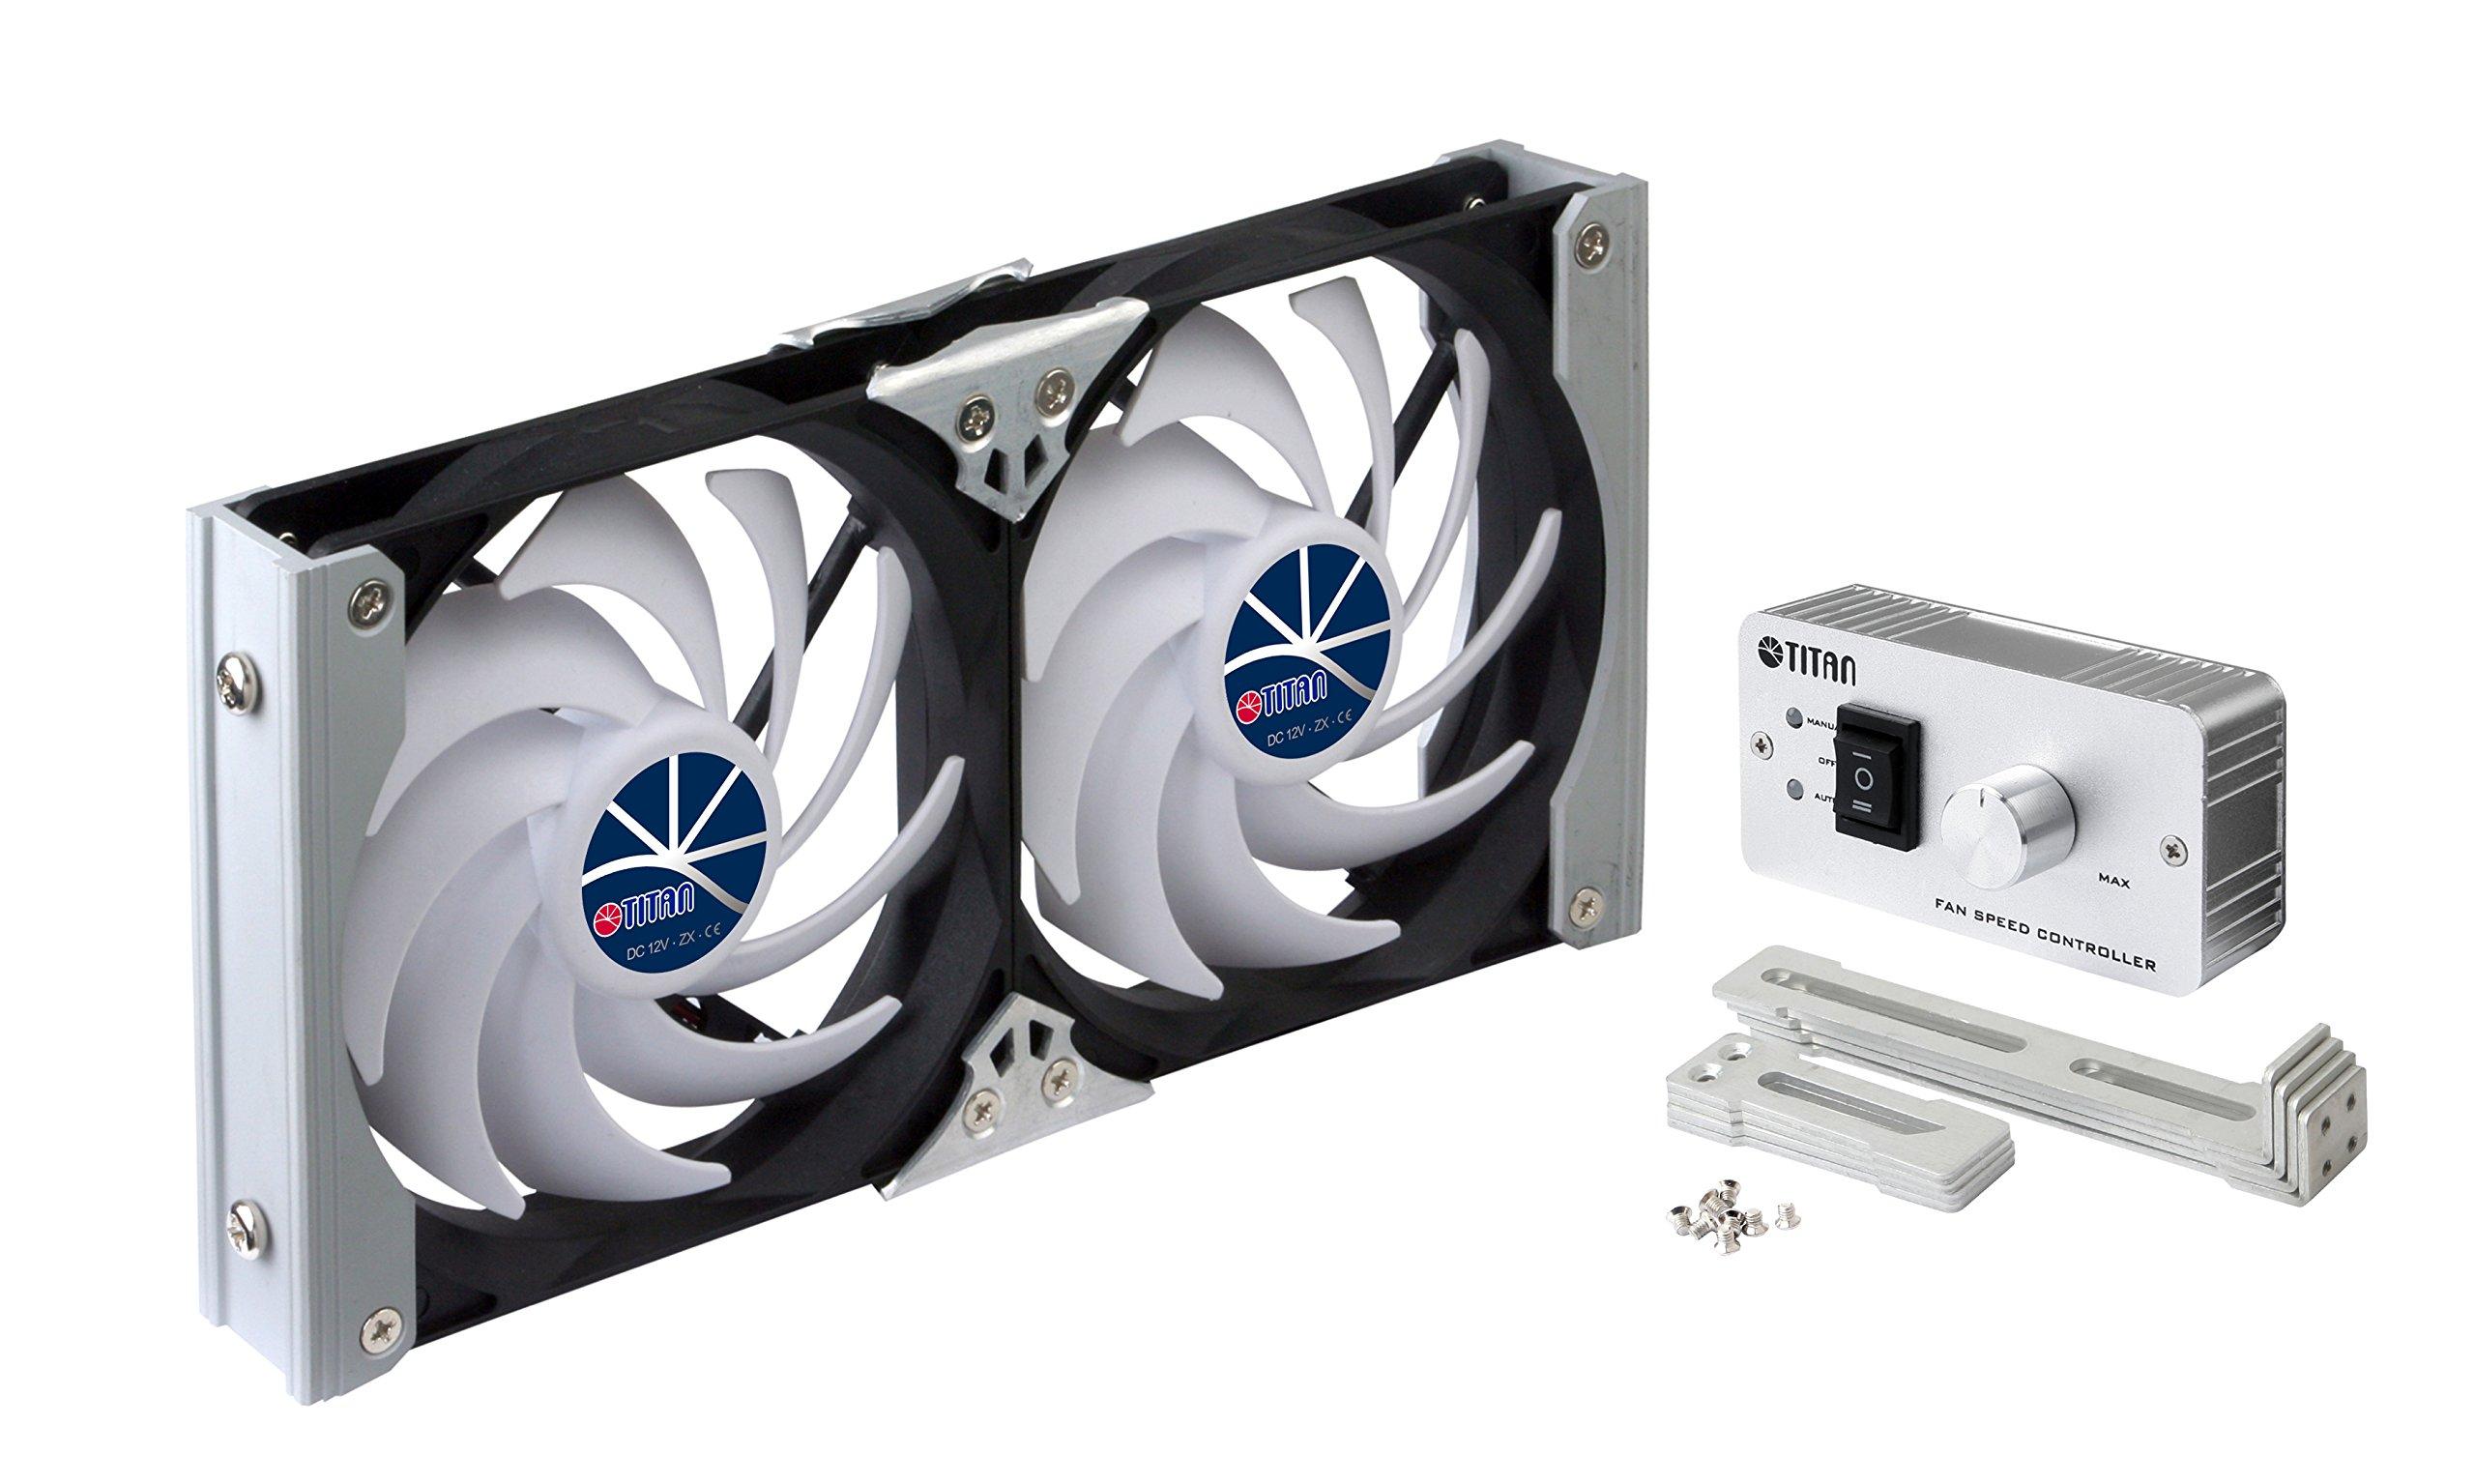 TITAN- 12V/24V DC 120mm Multi-function DIY Rack Mounting Double Refrigerator Fan with Speed Controller for Motorhome, Camper Van, Camper Truck, Trailer